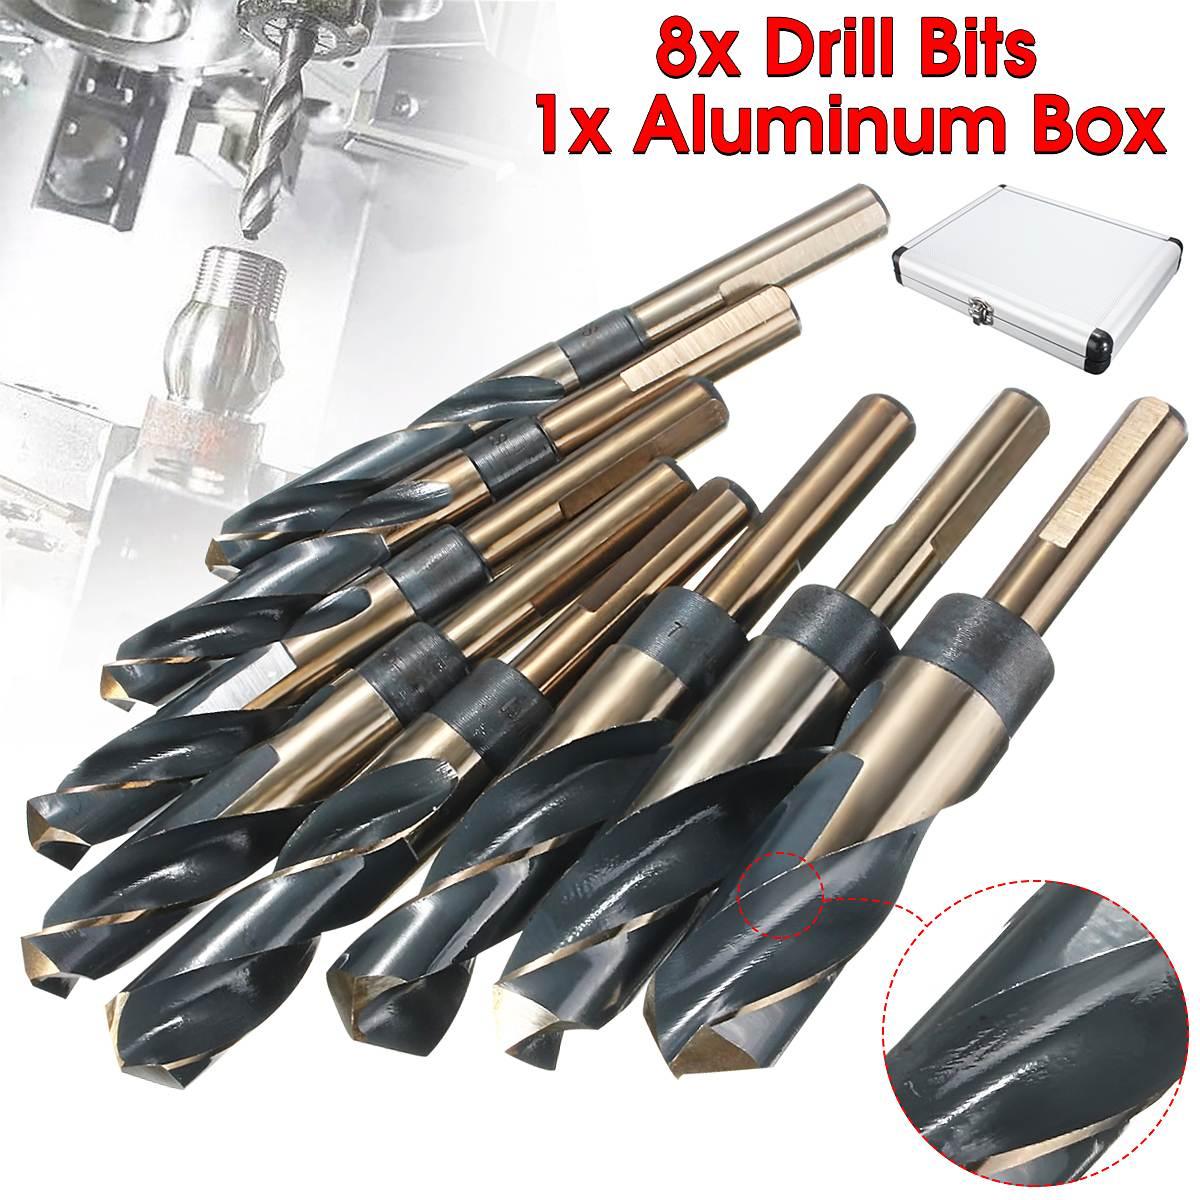 8PC HSS Cobalt Silver Deming Drill Bits Set surprise price 22mm cobalt alloys forstner drill bits set for sale